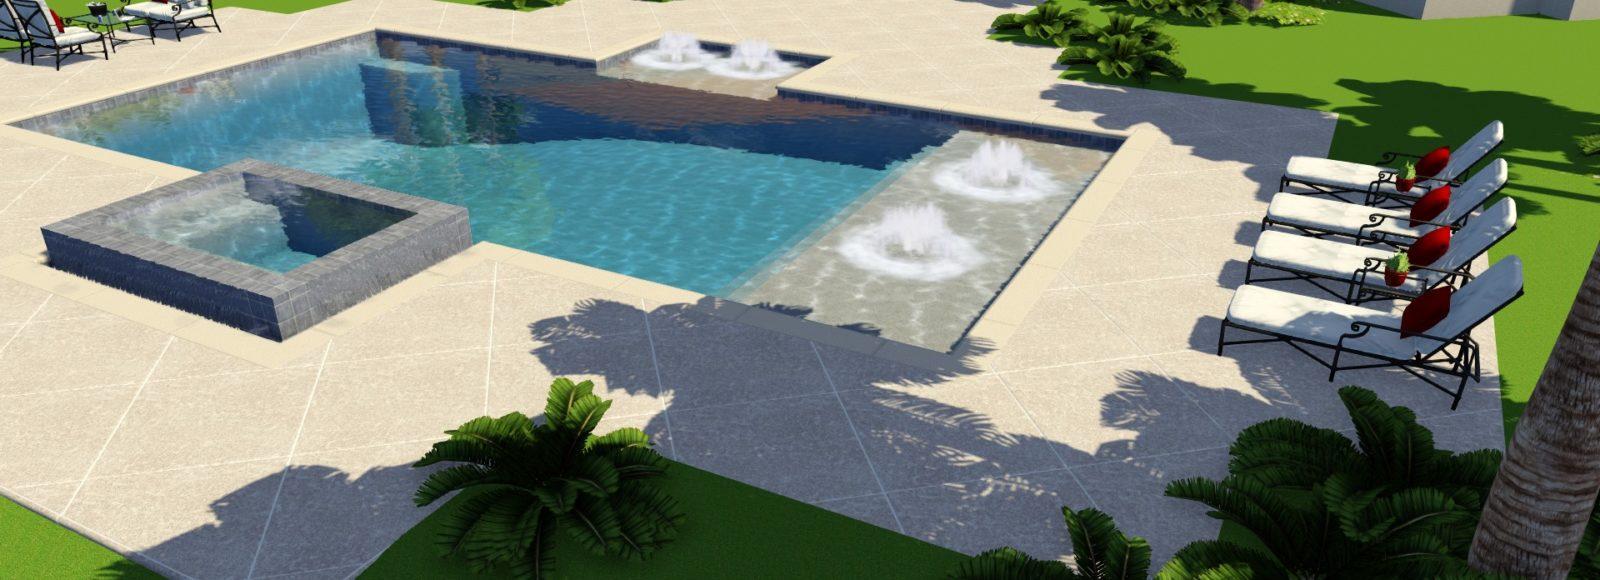 Sammet Pools, Inc. | Designing & Constructing Pools and Spas